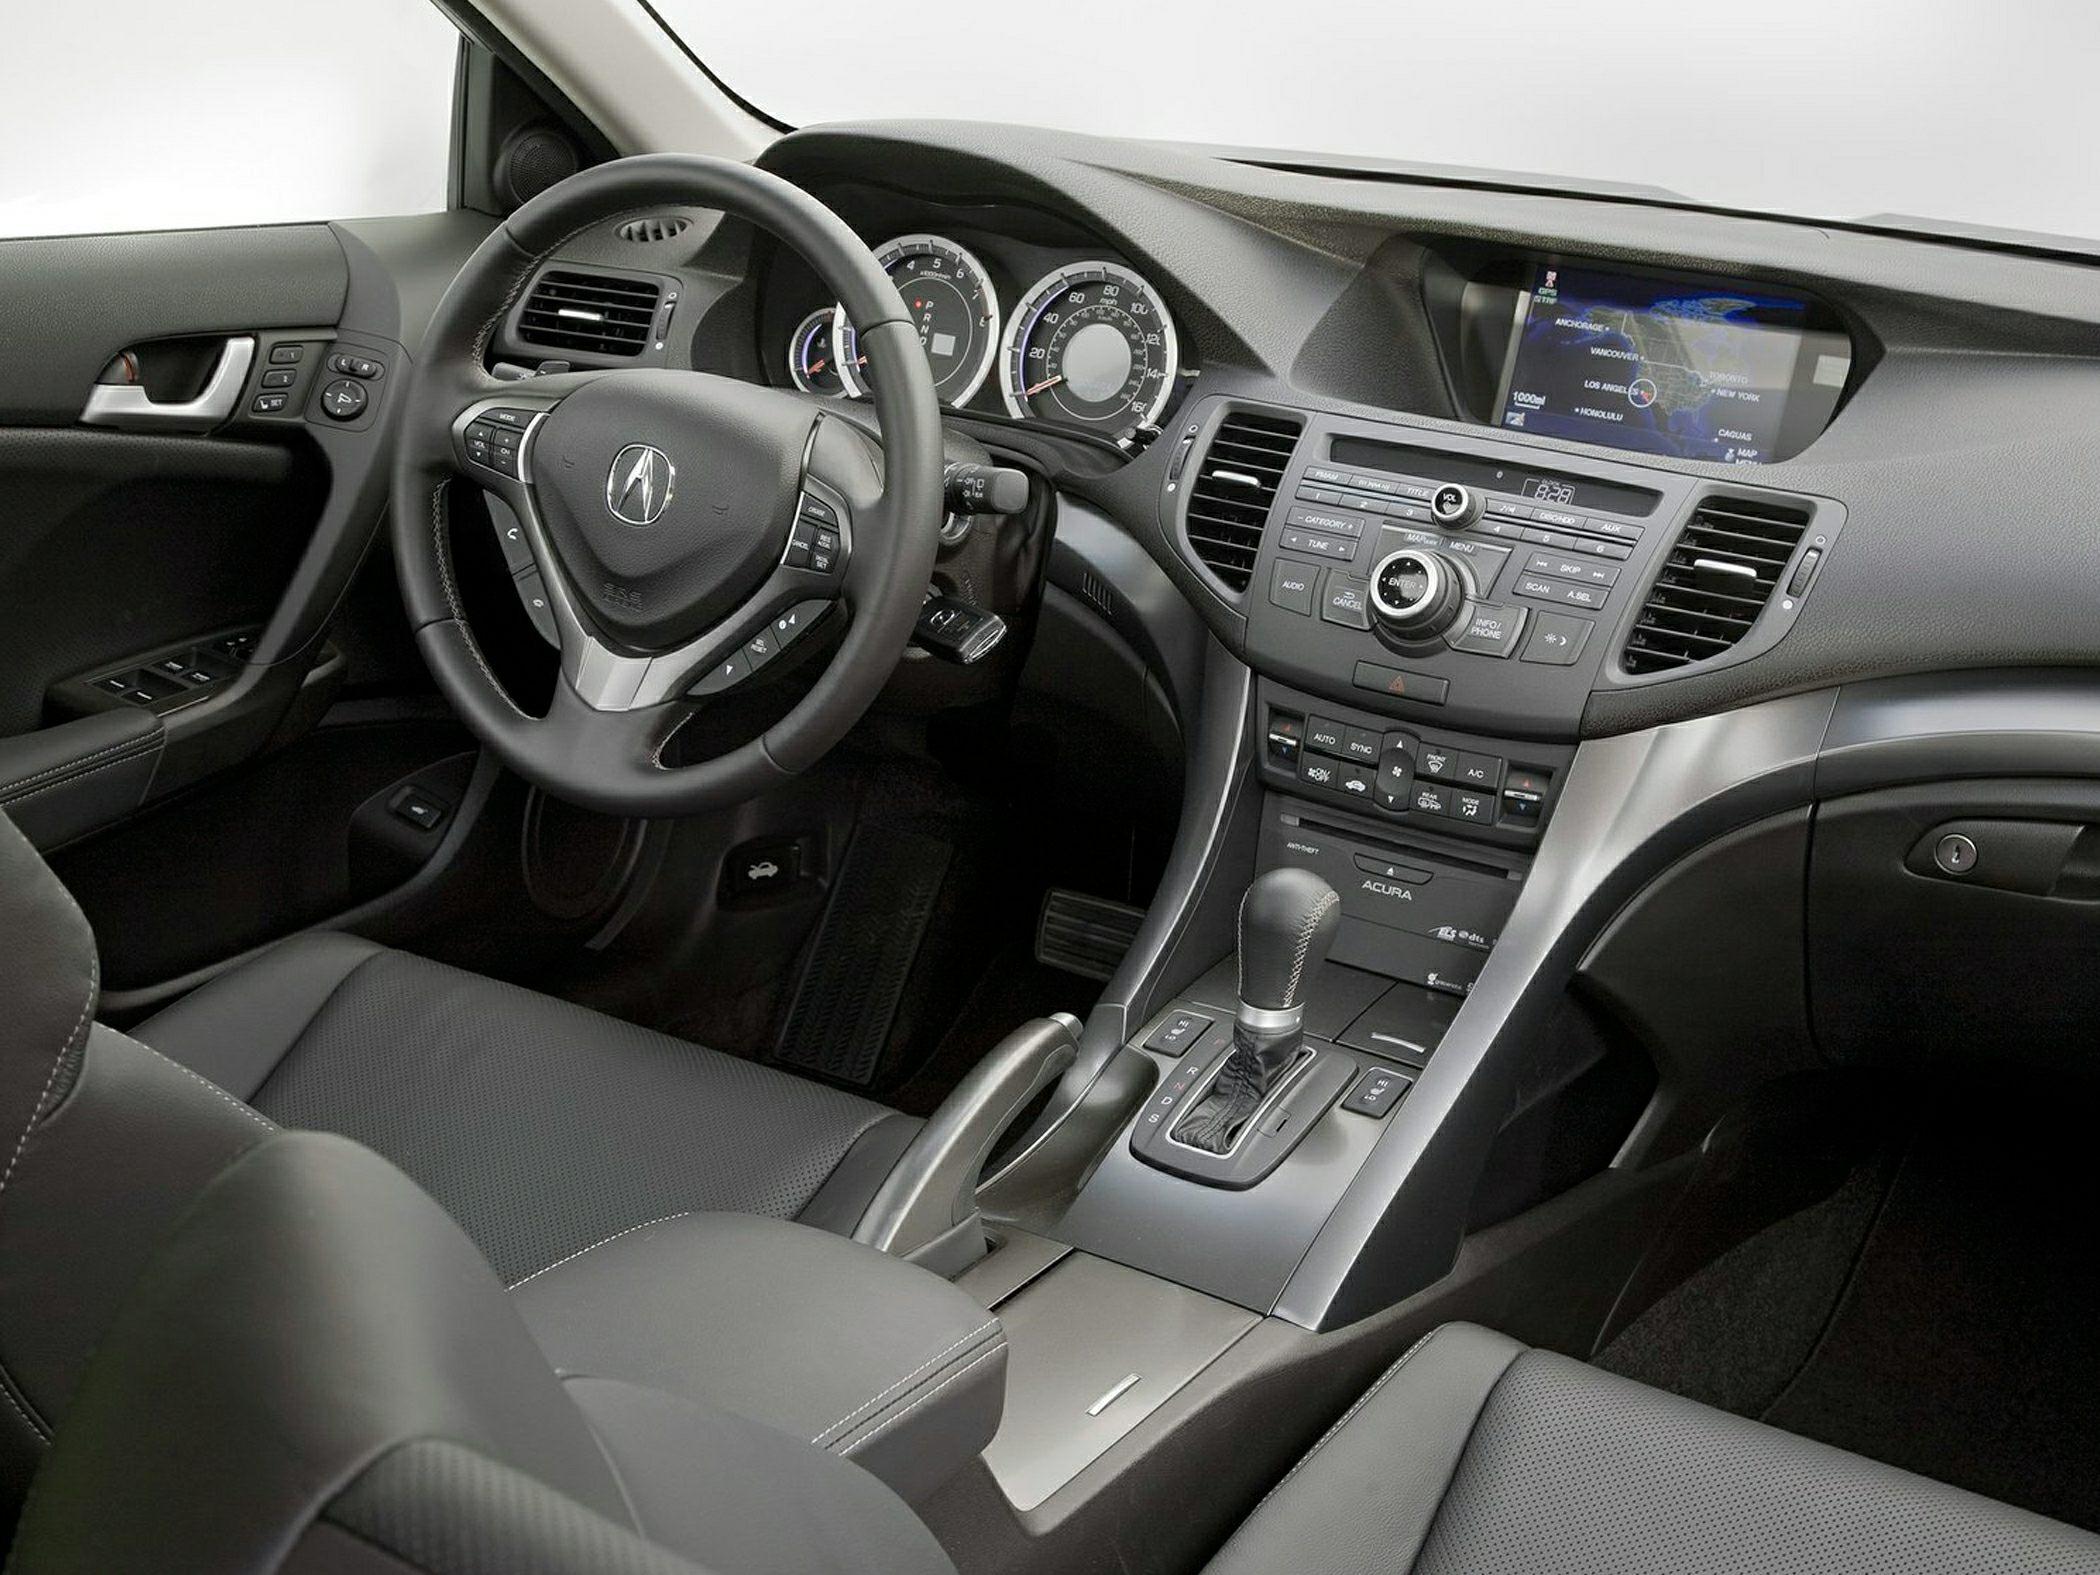 2014 Acura TSX Interior